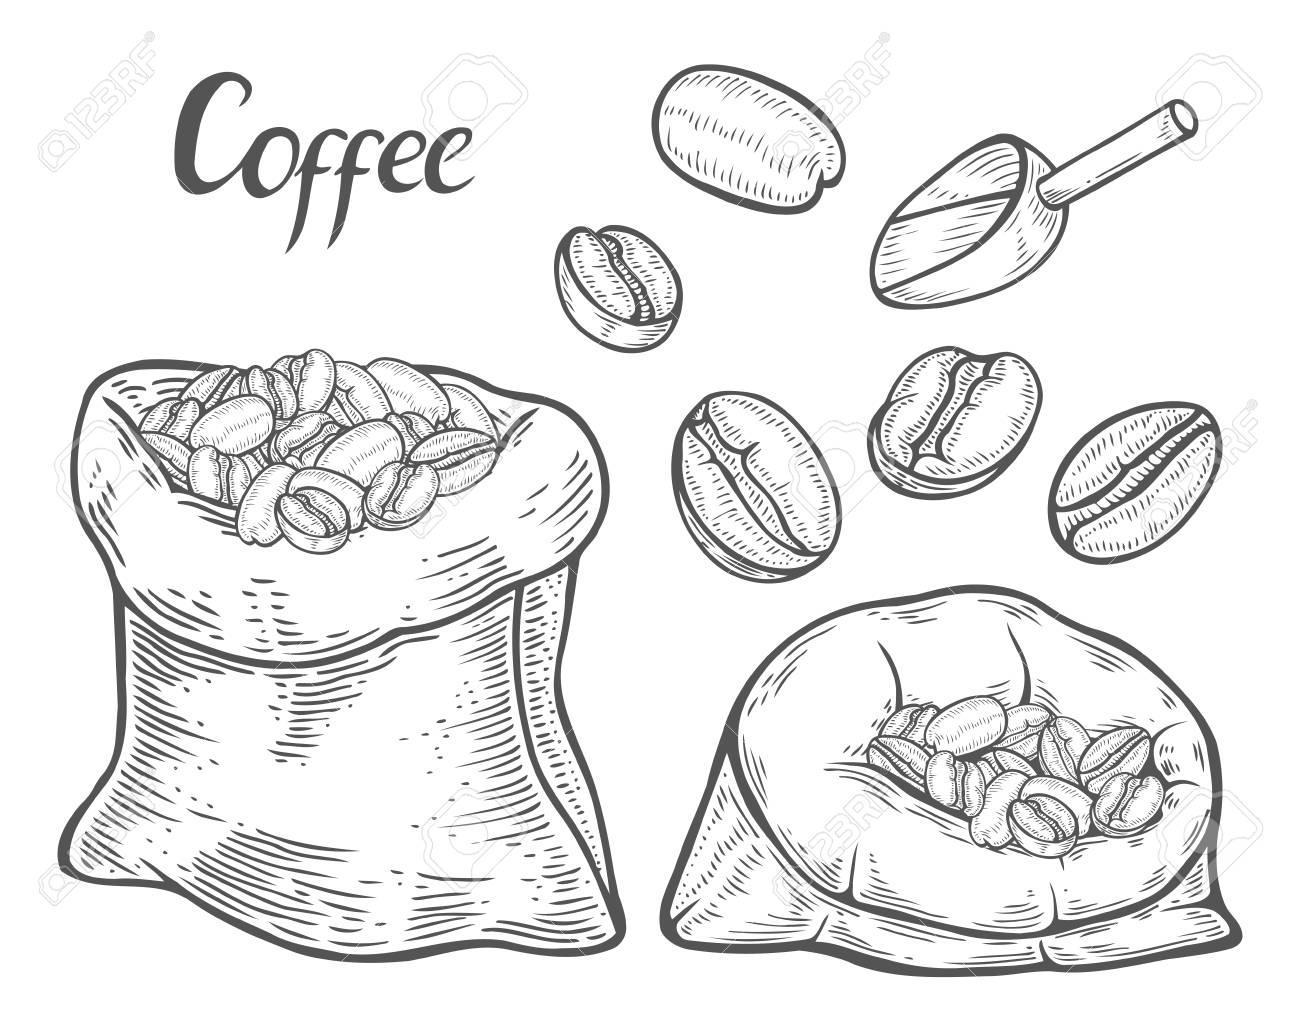 In Caffè Mano Pmvgsuzq Borse Vettoriale Set Chicchi A Disegnate Di 5q4RL3Aj